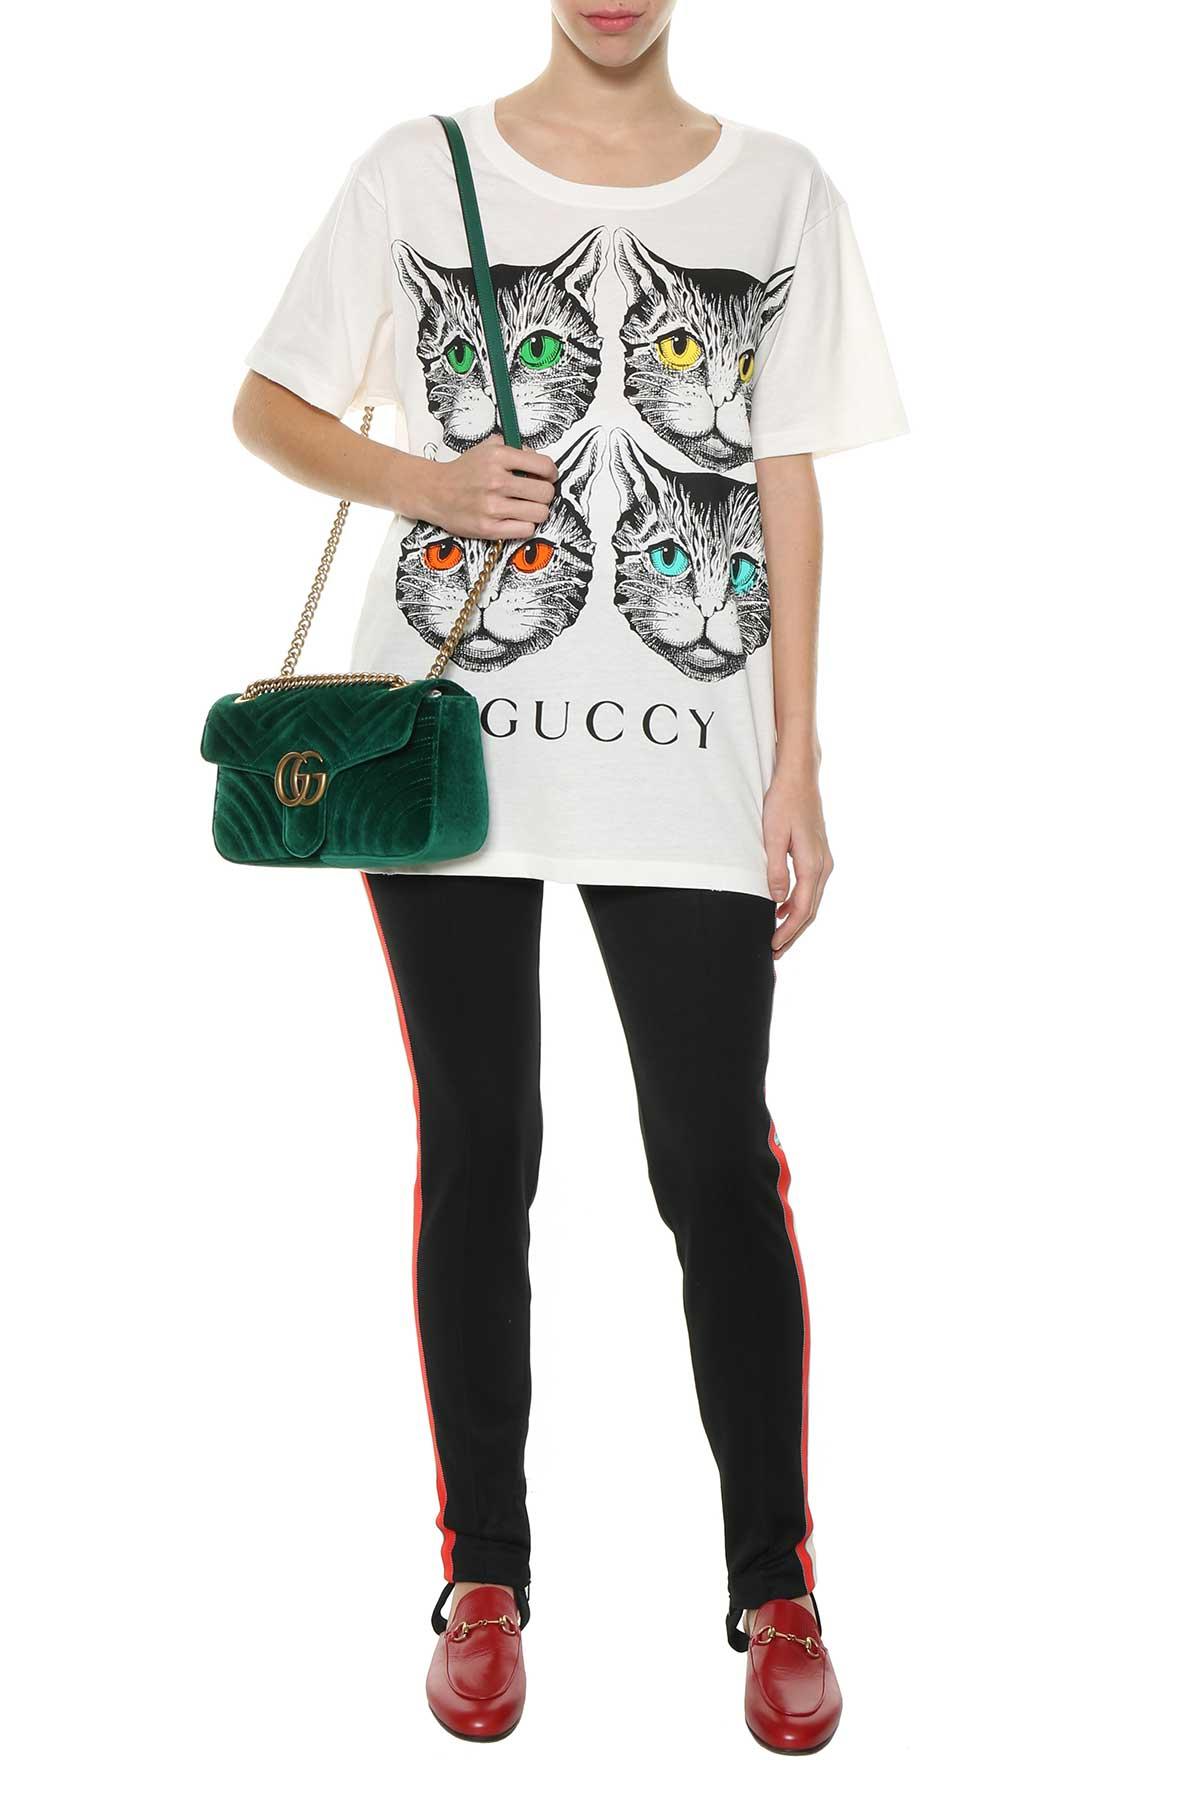 Gucci Logo Bands Leggings 10506620